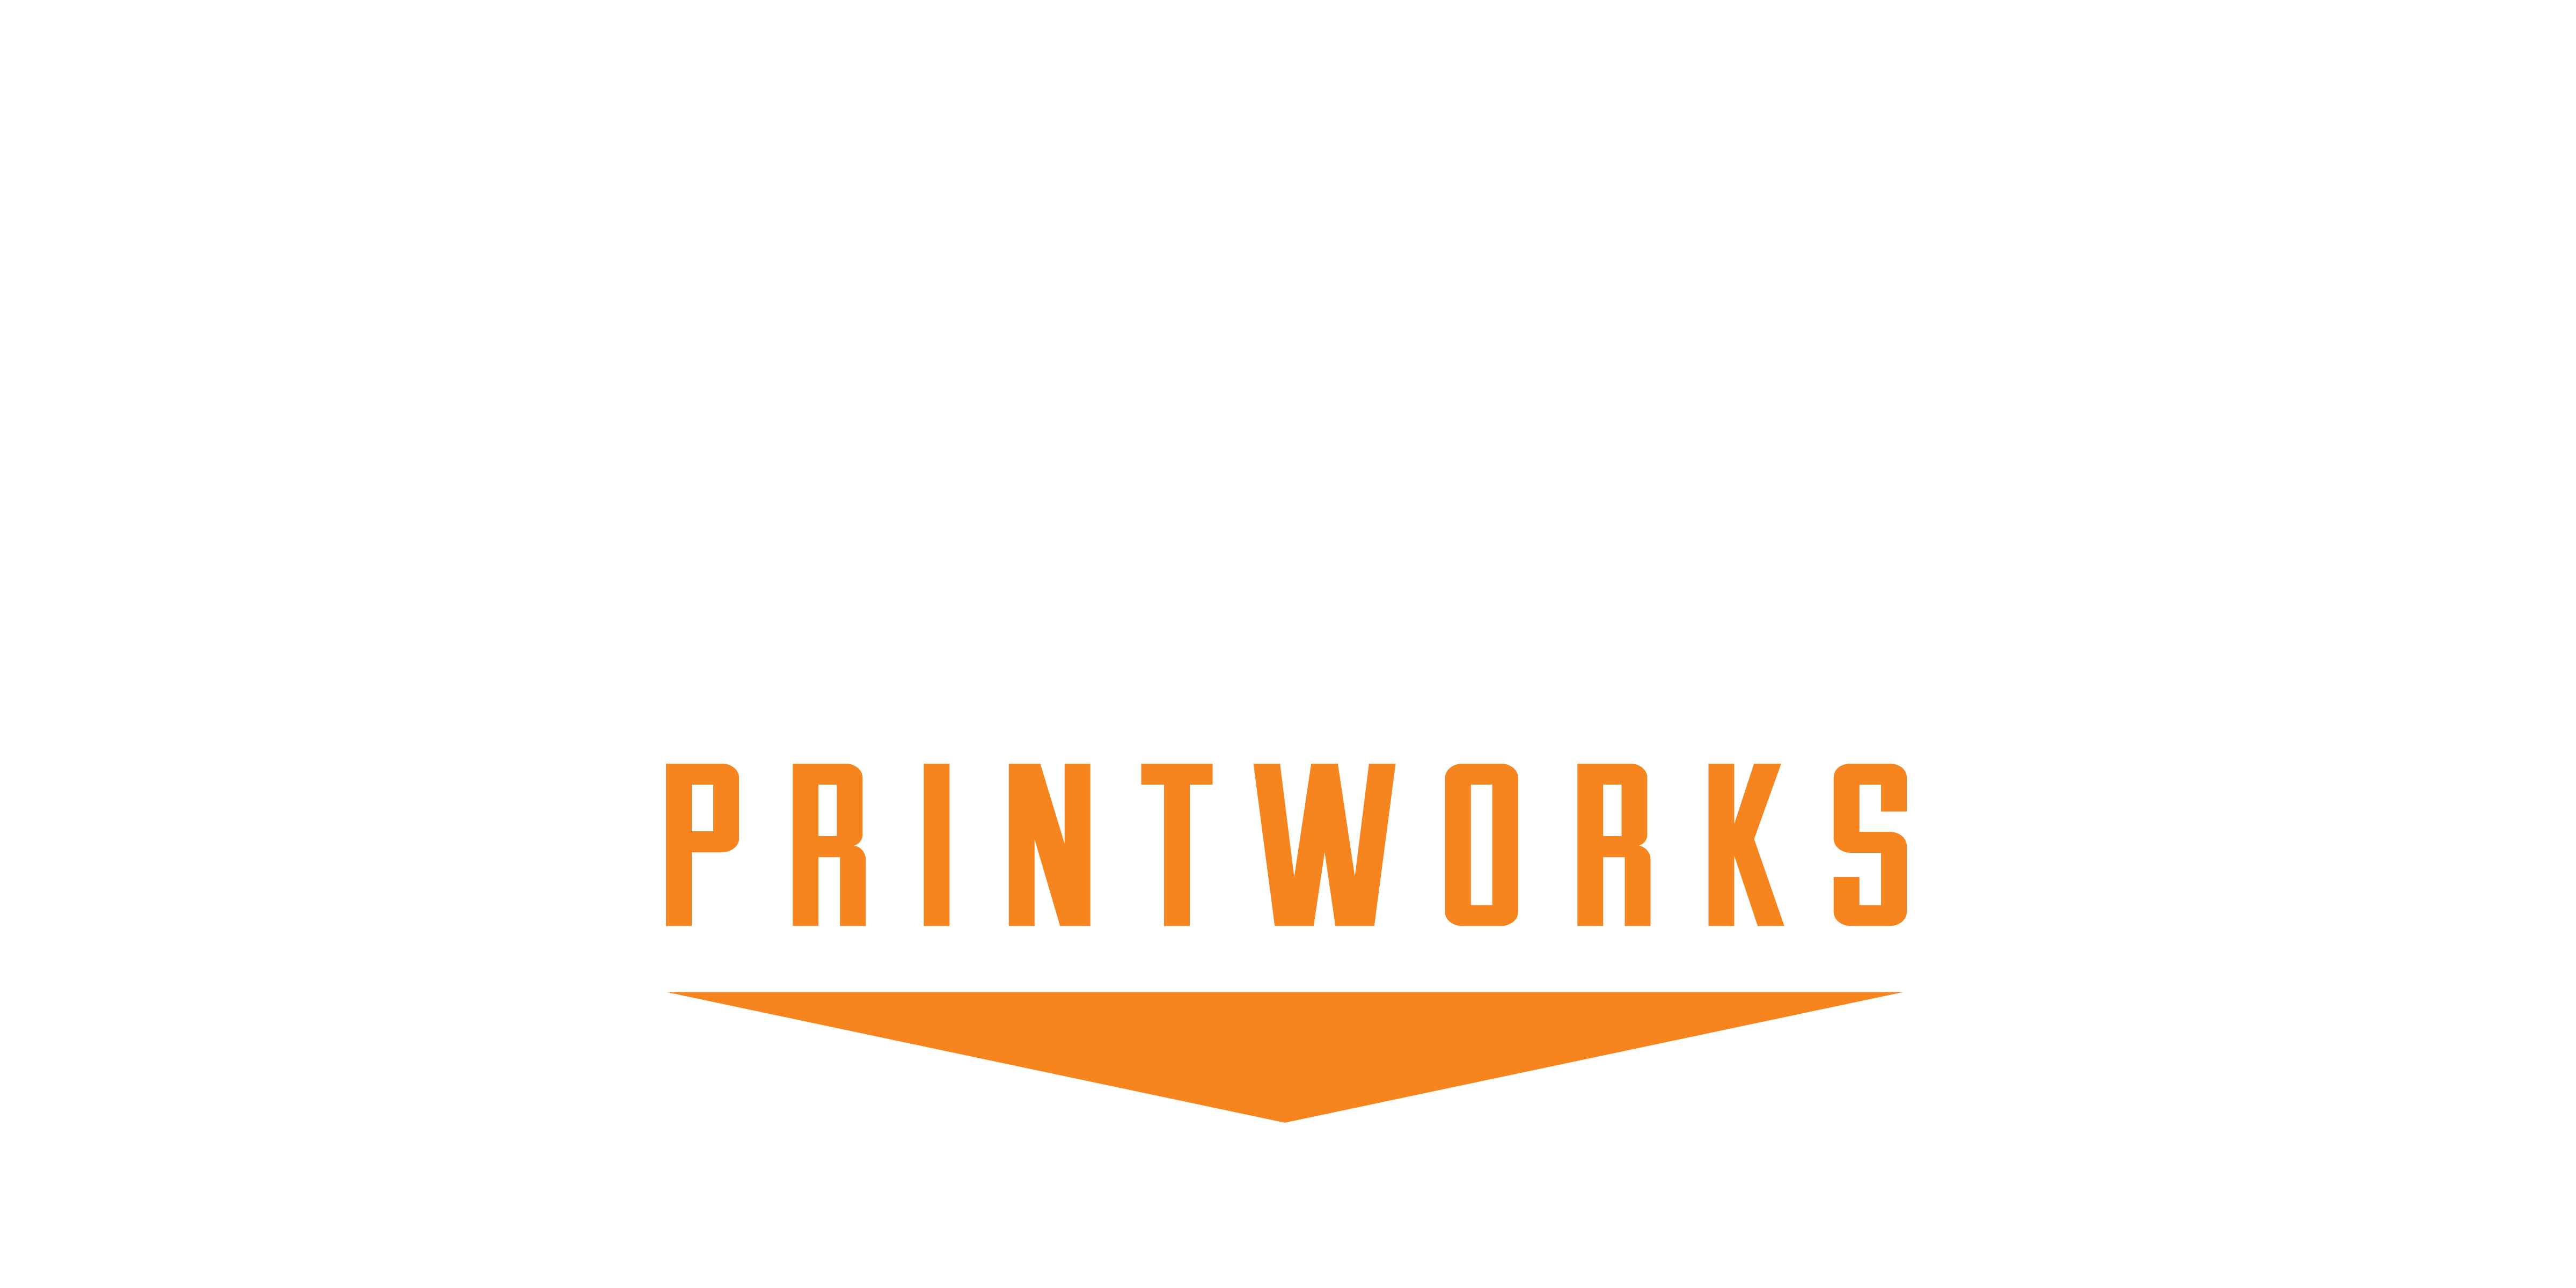 Revolution Printworks